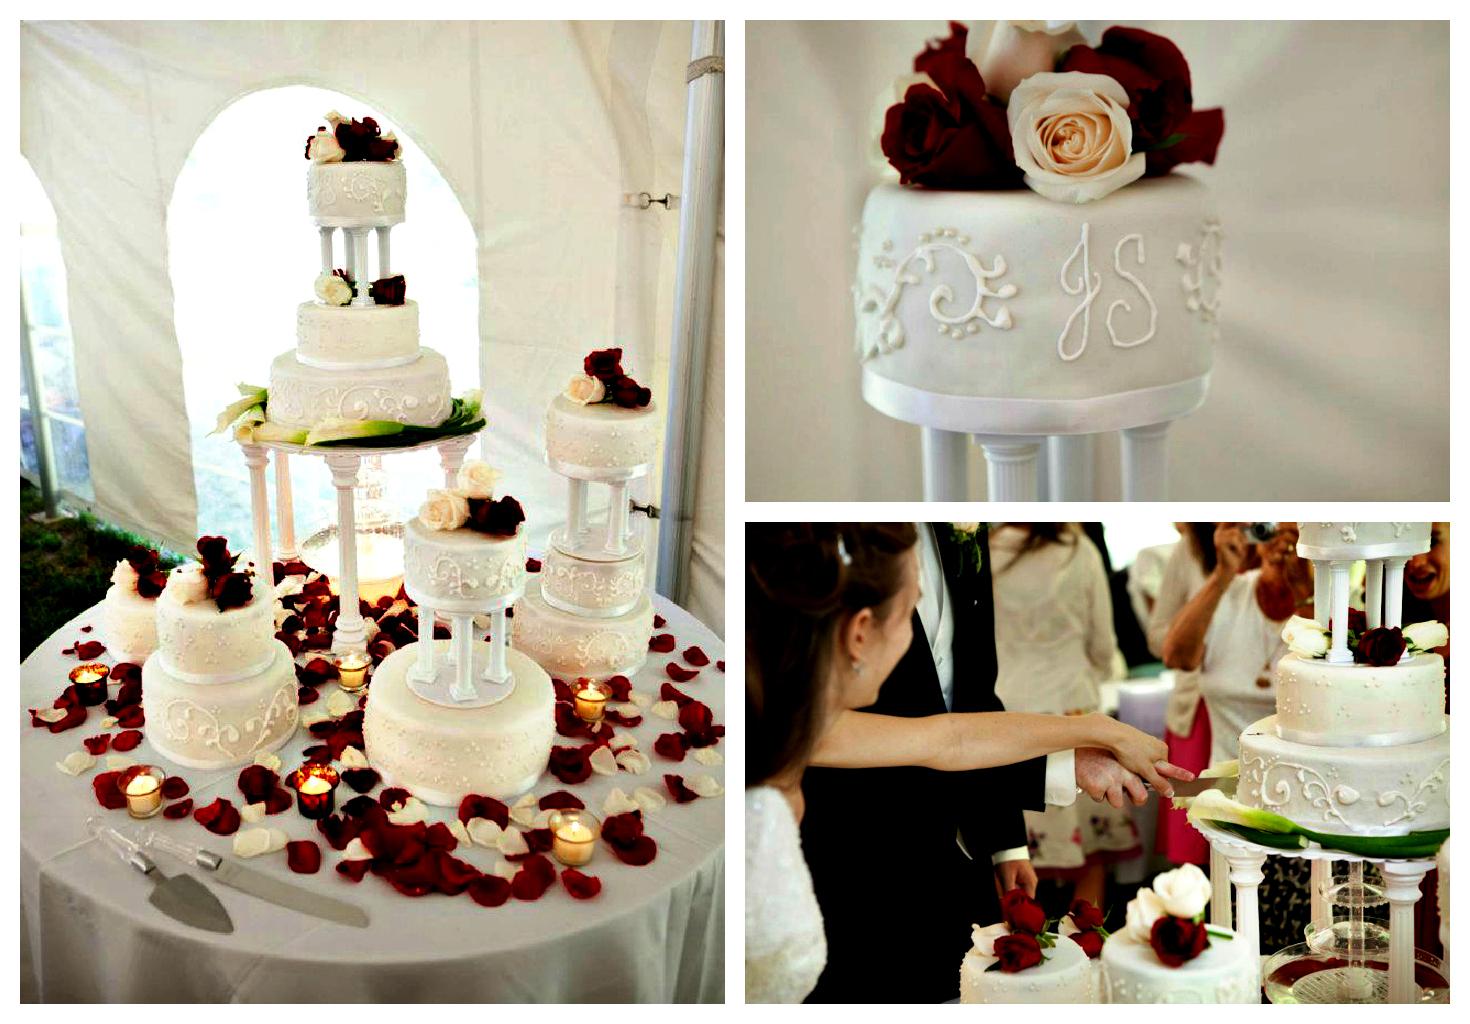 Modern Wedding Cakes For The Holiday Chocolate Wedding Cake Recipes